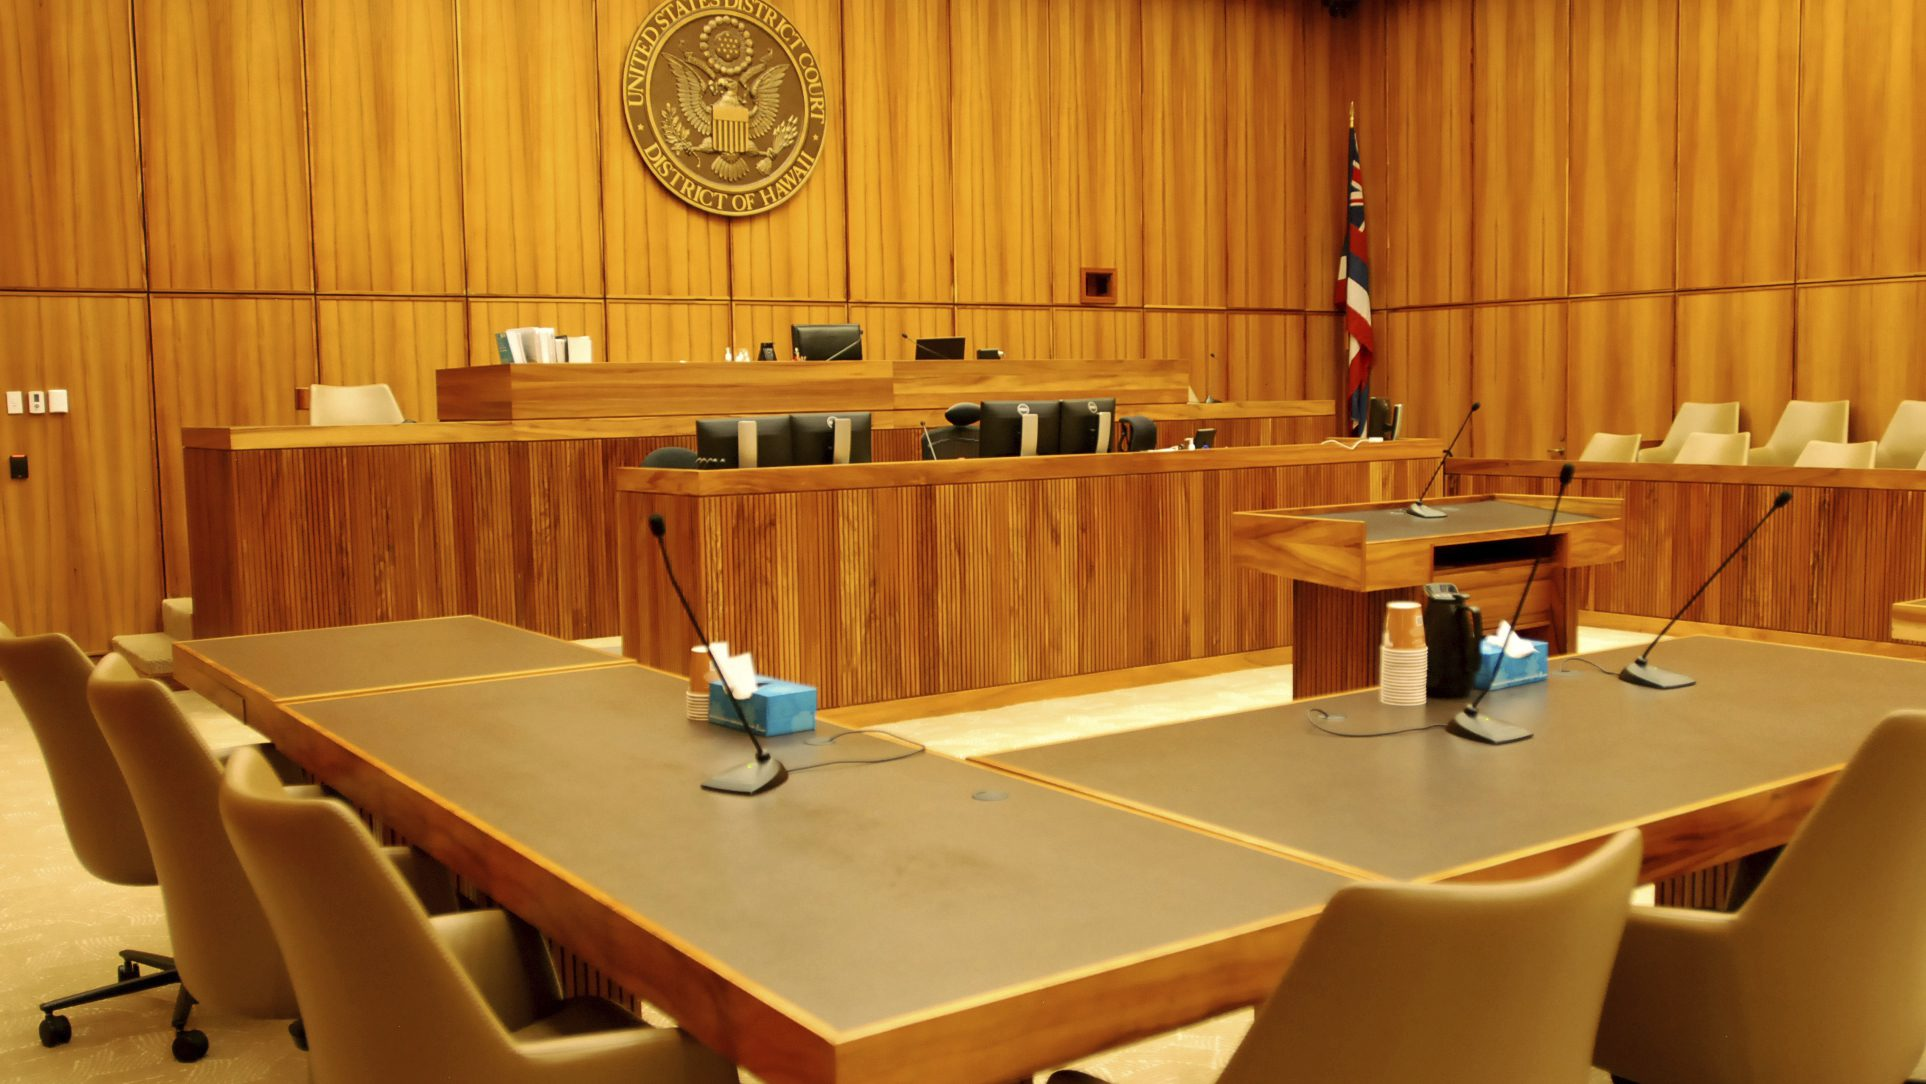 A U.S. federal courtroom sits empty on Monday, Feb. 13, 2017, in Honolulu. (AP Photo/Jennifer Sinco Kelleher)